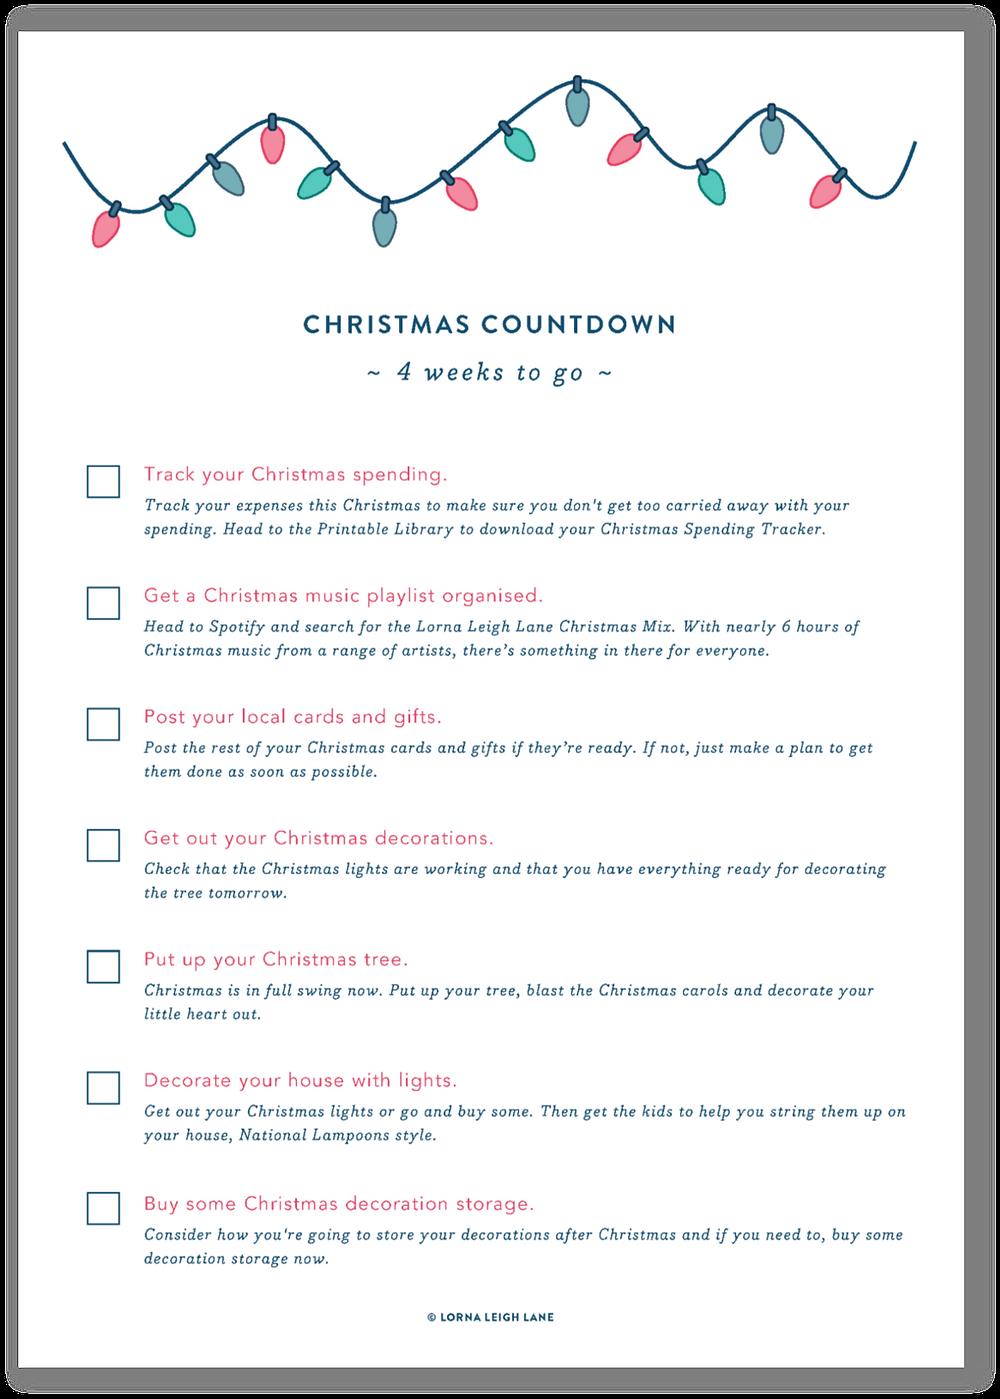 Christmas Countdown - 5 weeks to go